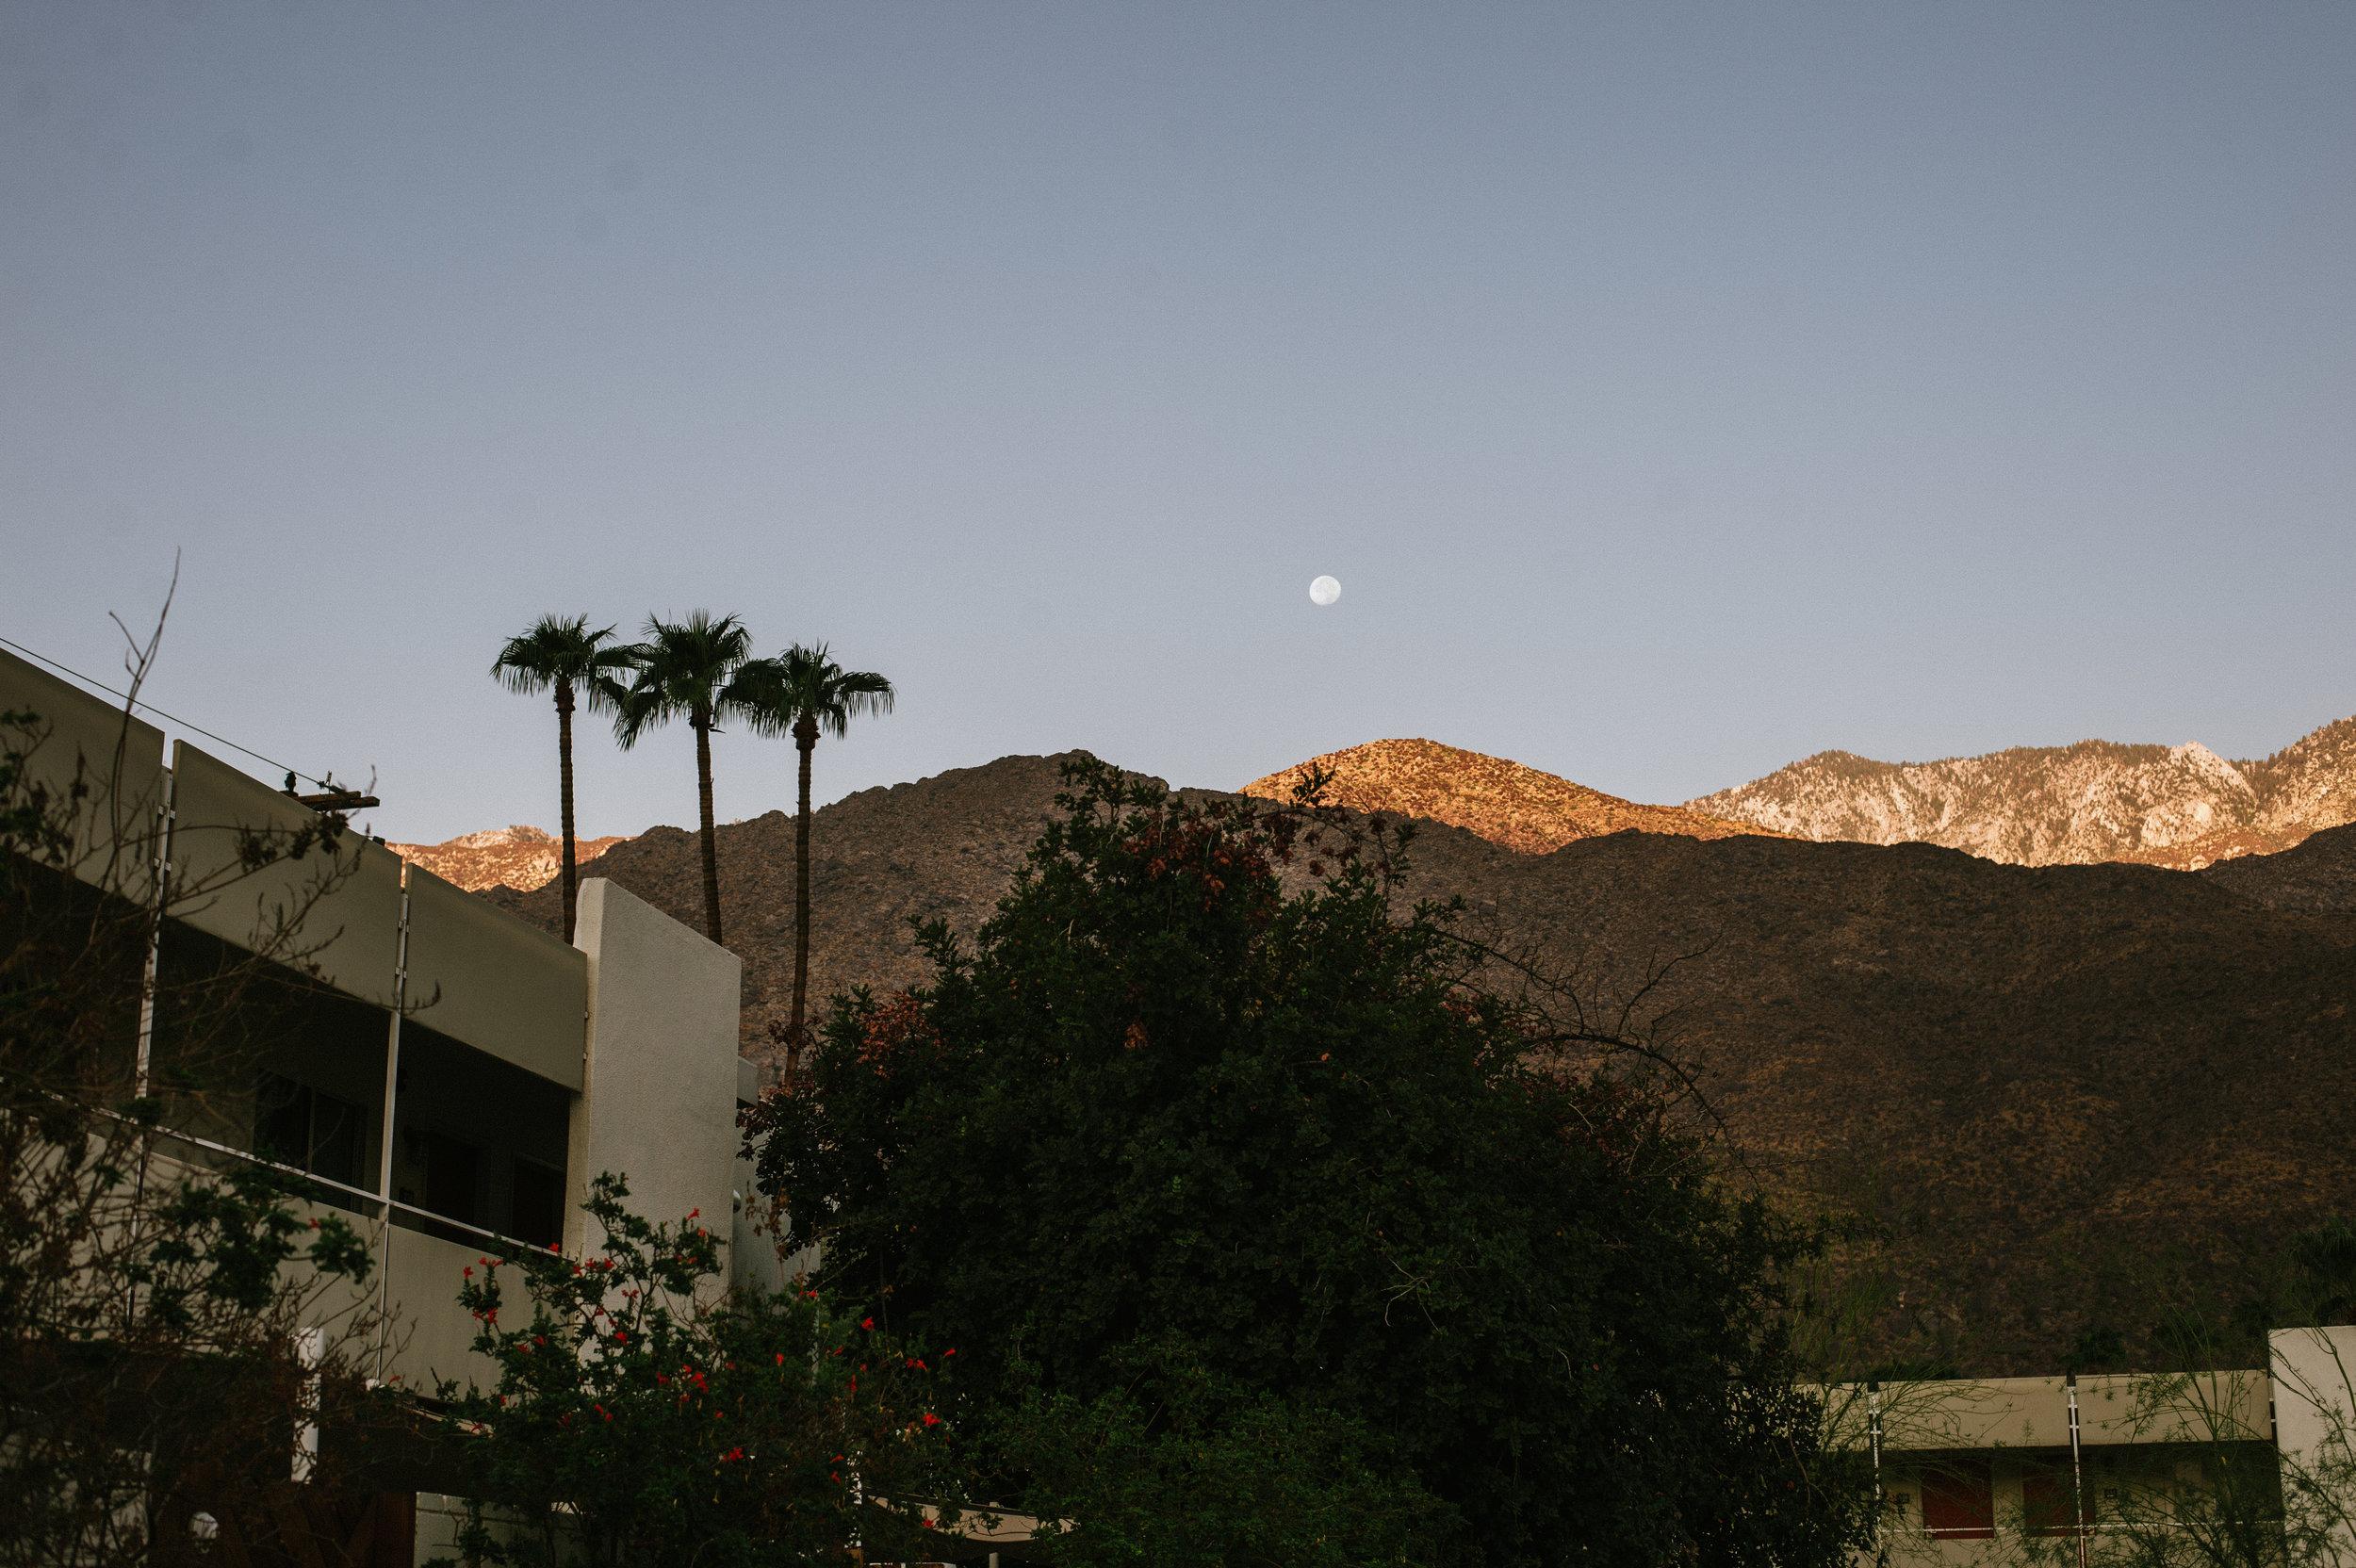 The-Glossier-Ace-Hotel-Palm-Springs-CA-13.jpg